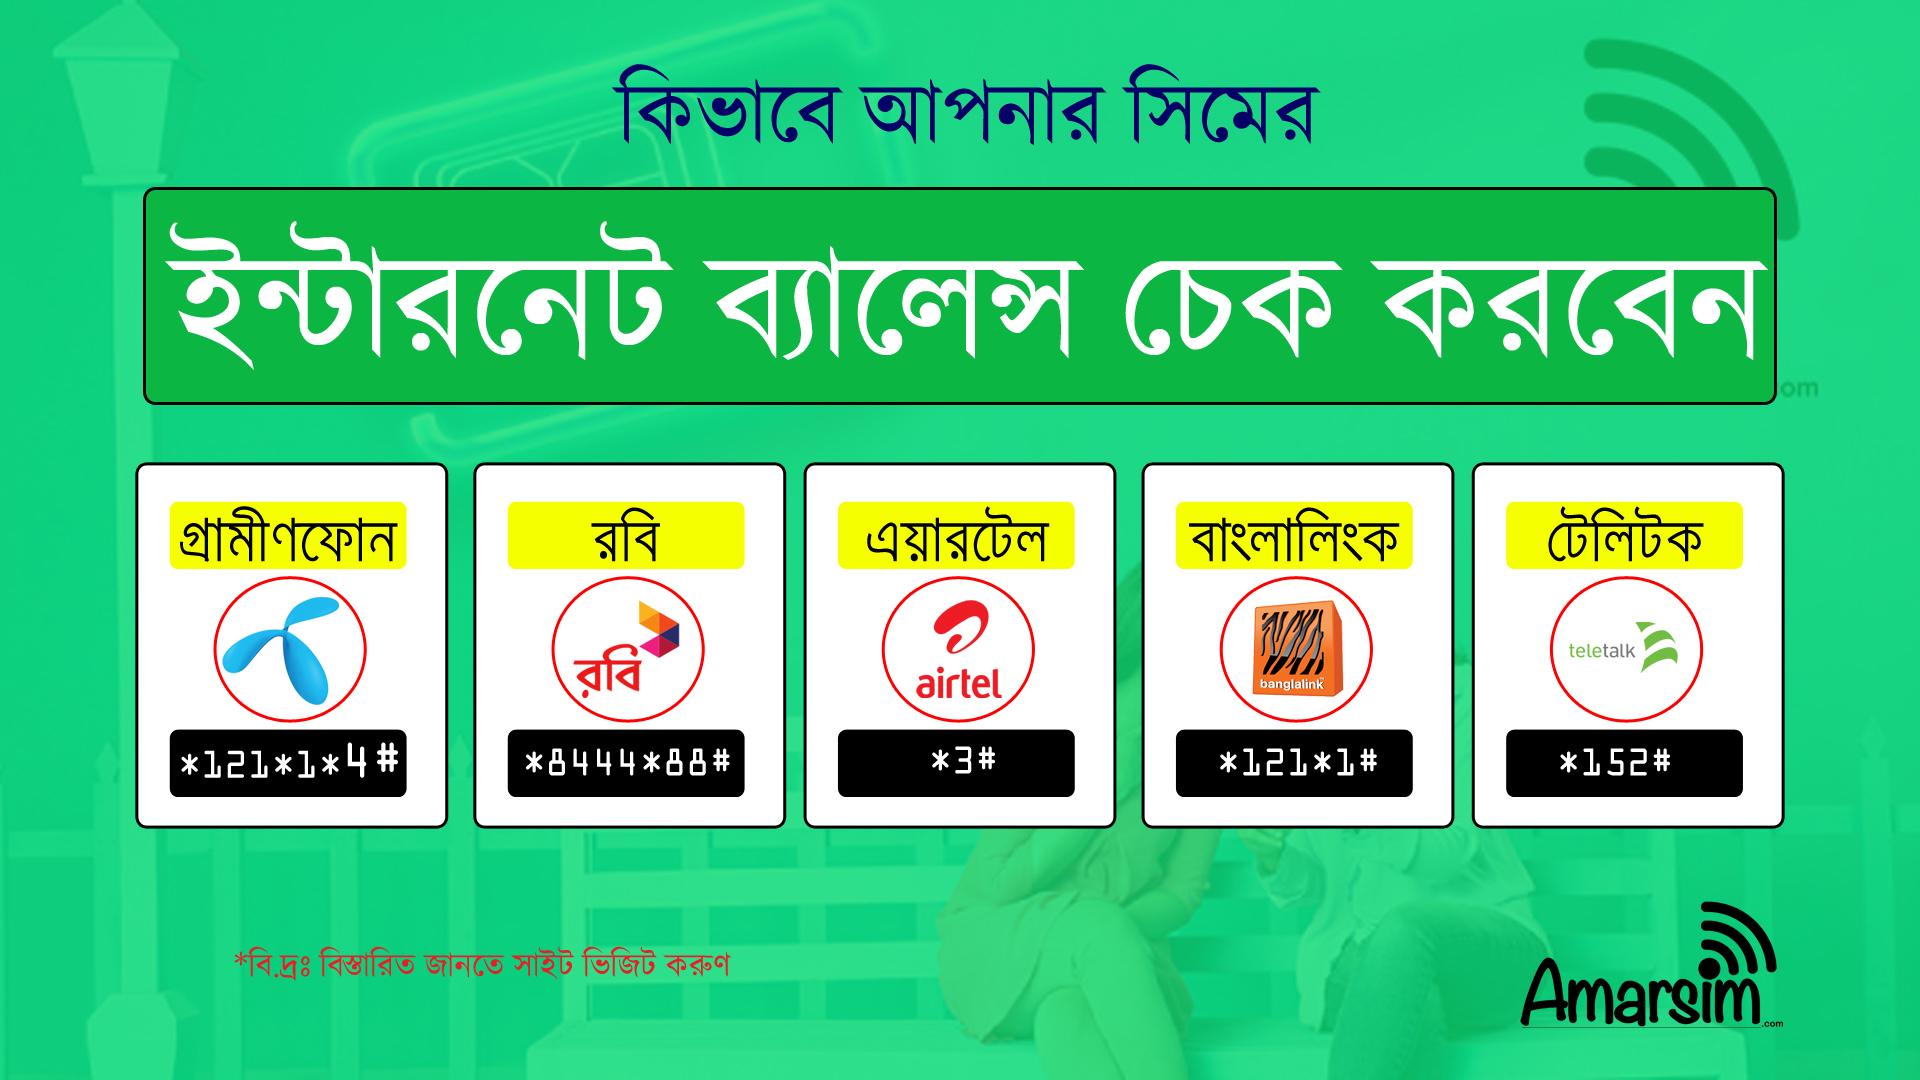 How To Check Internet Balance In GP, Robi, Airtel, Banglalink, Teletalk